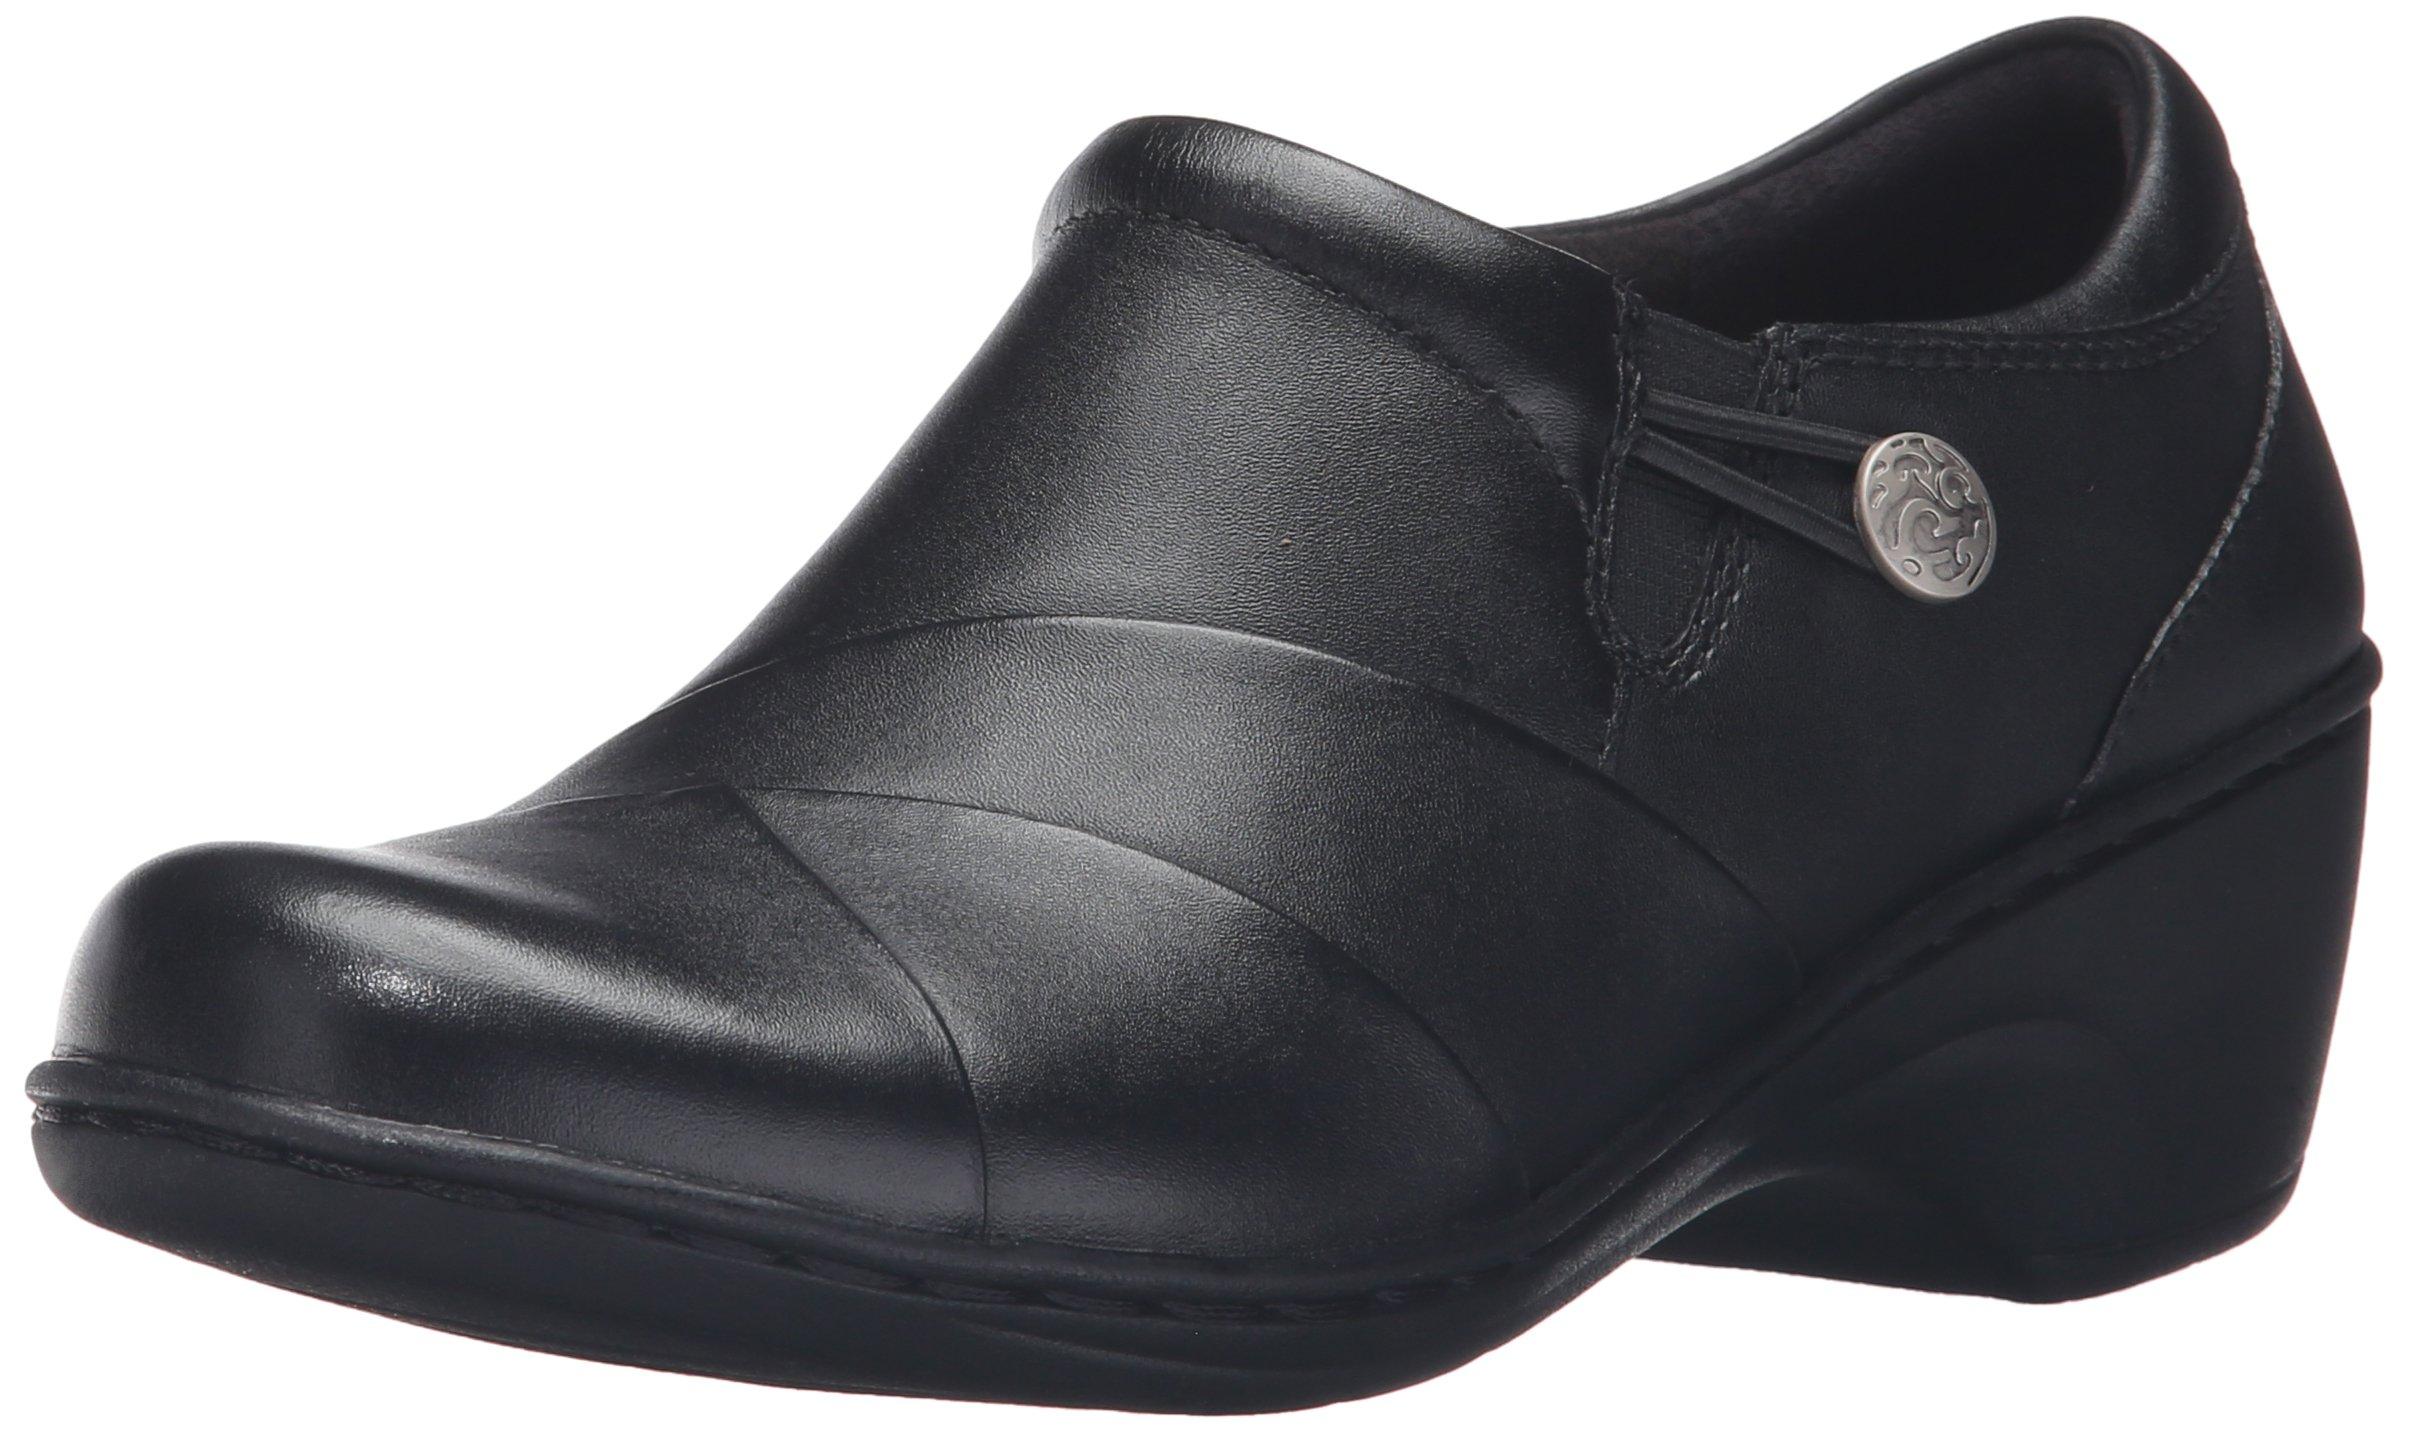 CLARKS Women's Channing Ann Slip-On Loafer, Black Leather, 8 M US